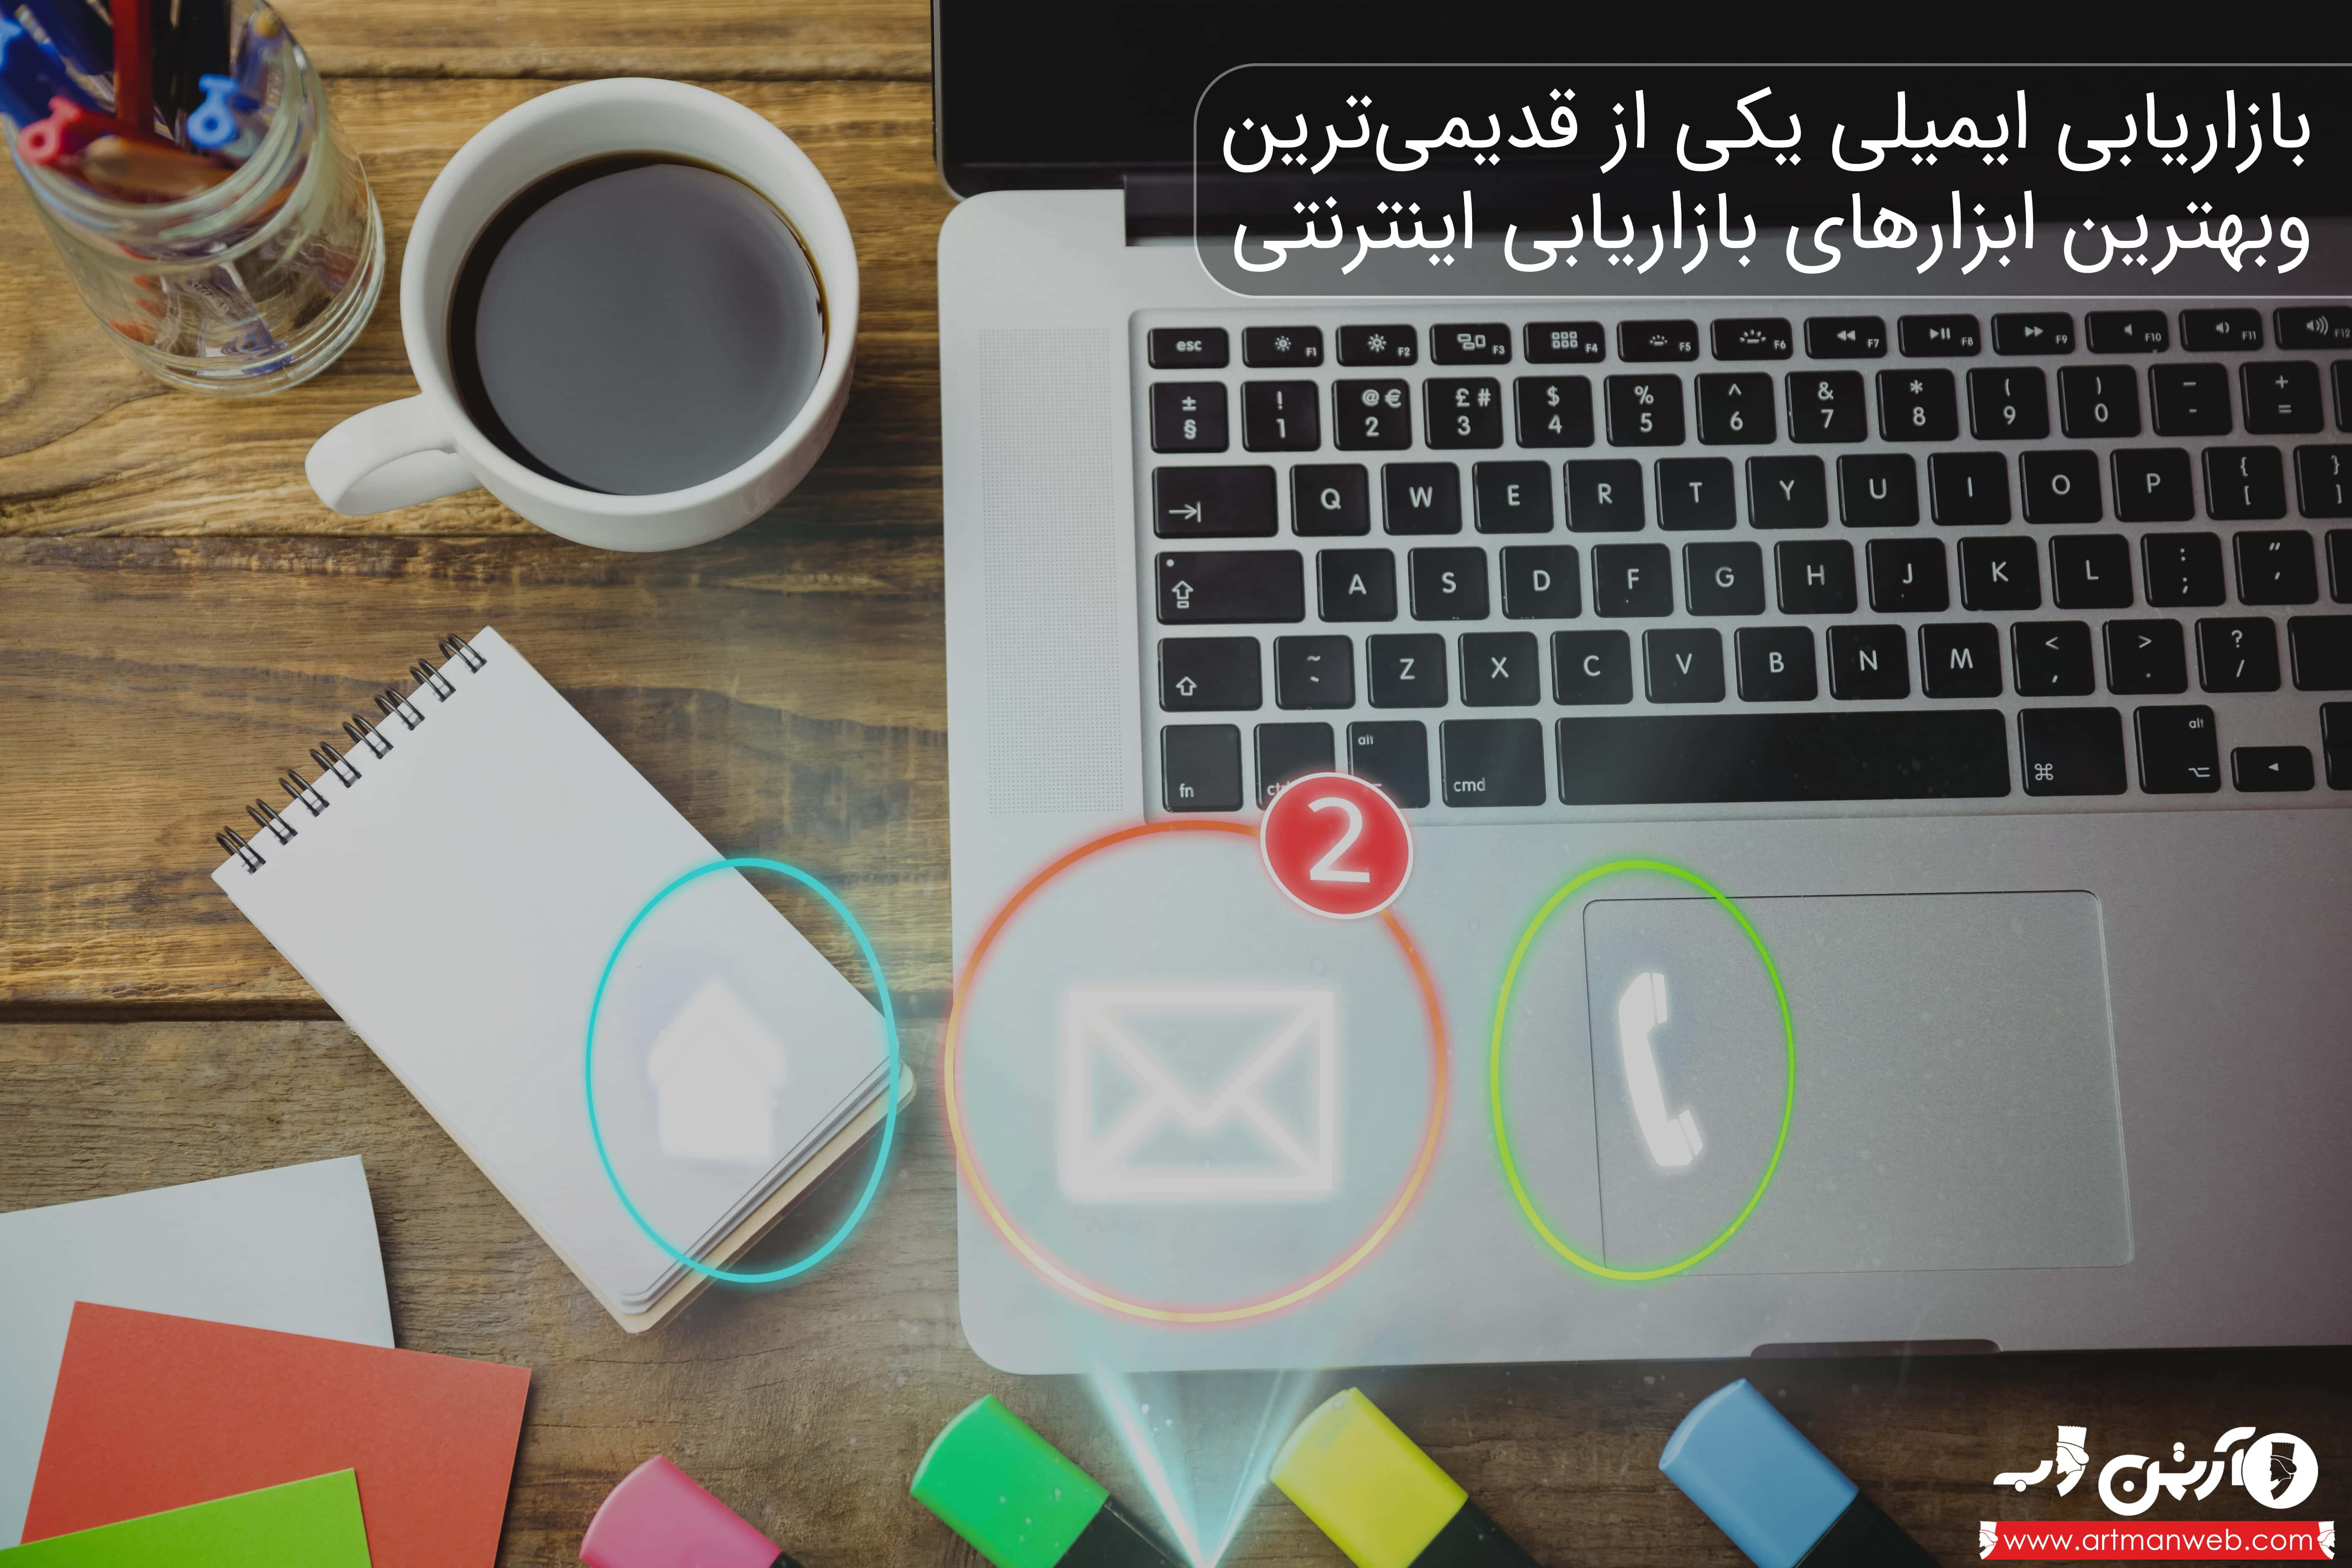 بازاریابی پوش نوتیفیکیشن بهتره یا بازاریابی ایمیلی؟